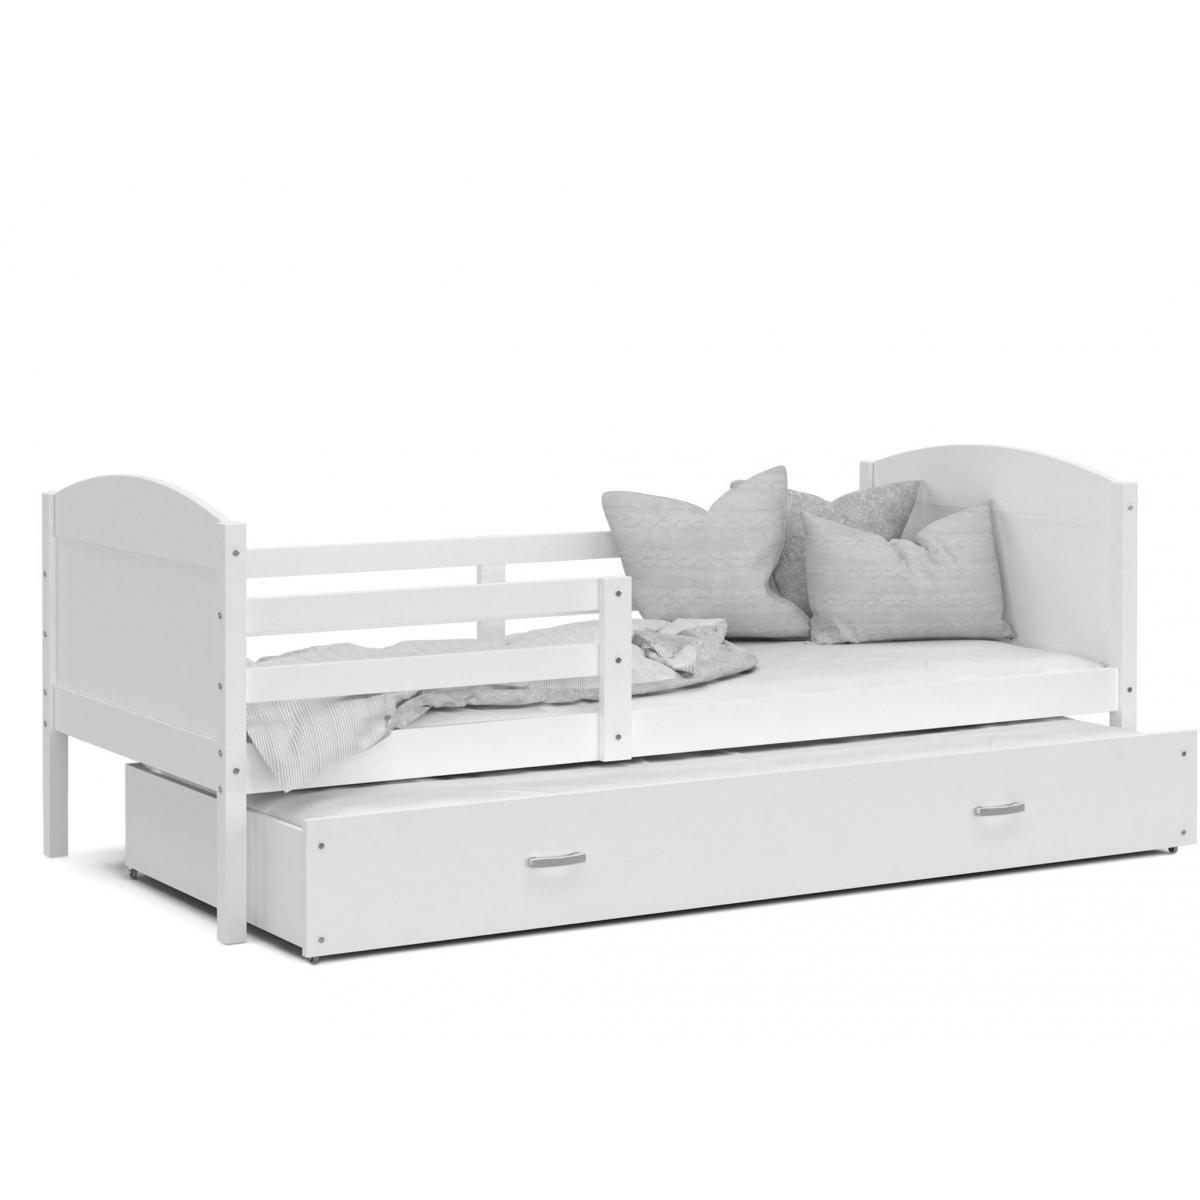 Kids Literie LIT Gigogne Mateo 90x190 Blanc - Blanc livré avec sommier, tiroir et matelas de 7cm OFFERT.